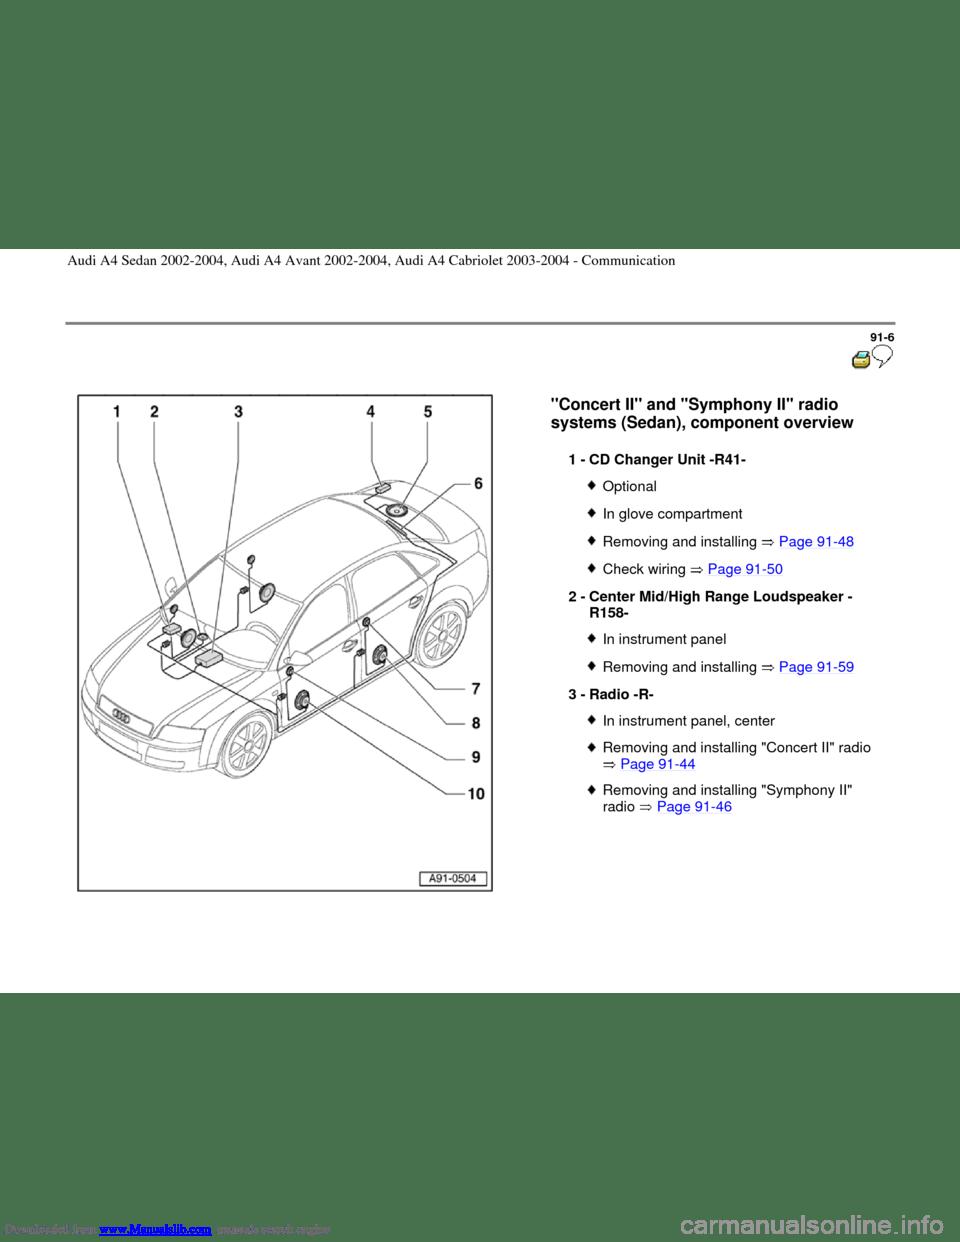 medium resolution of  audi concert ii wiring diagram audi accessories audi trailer on 1997